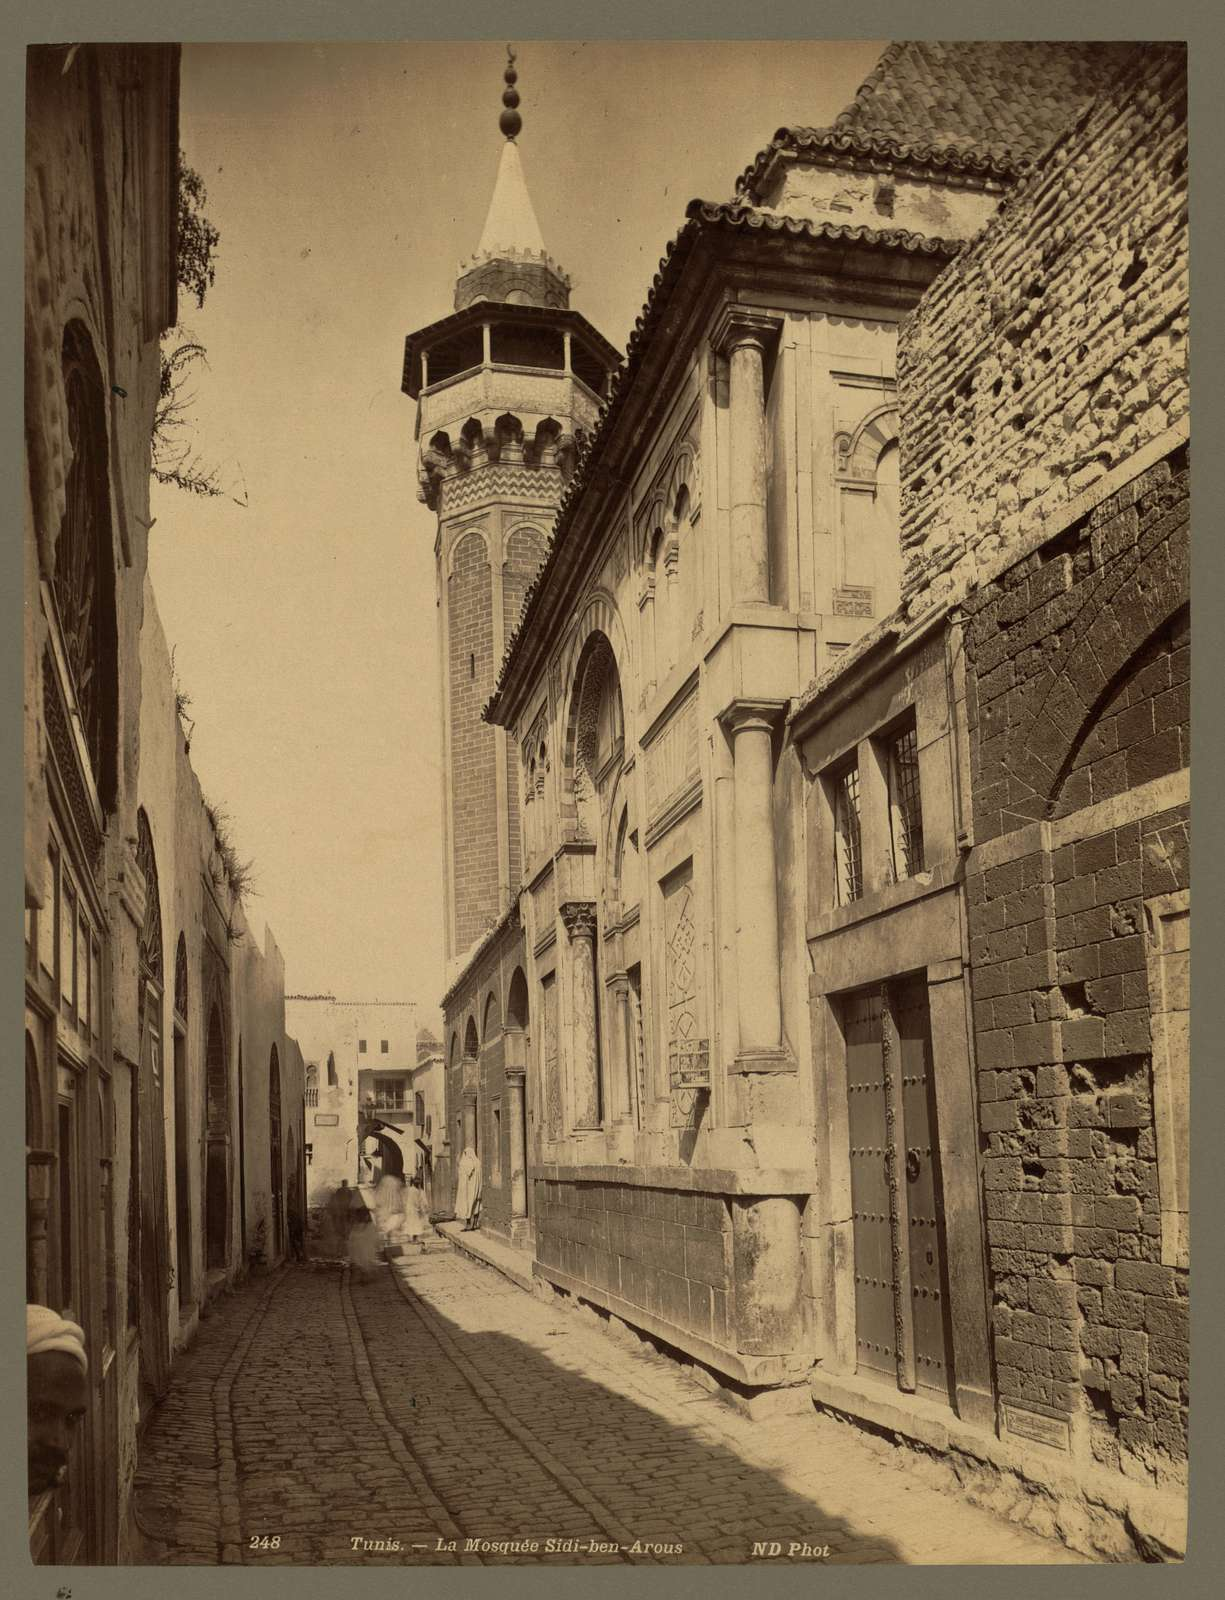 Tunis. La Mosquée Sidi-ben-Arous / ND Phot.